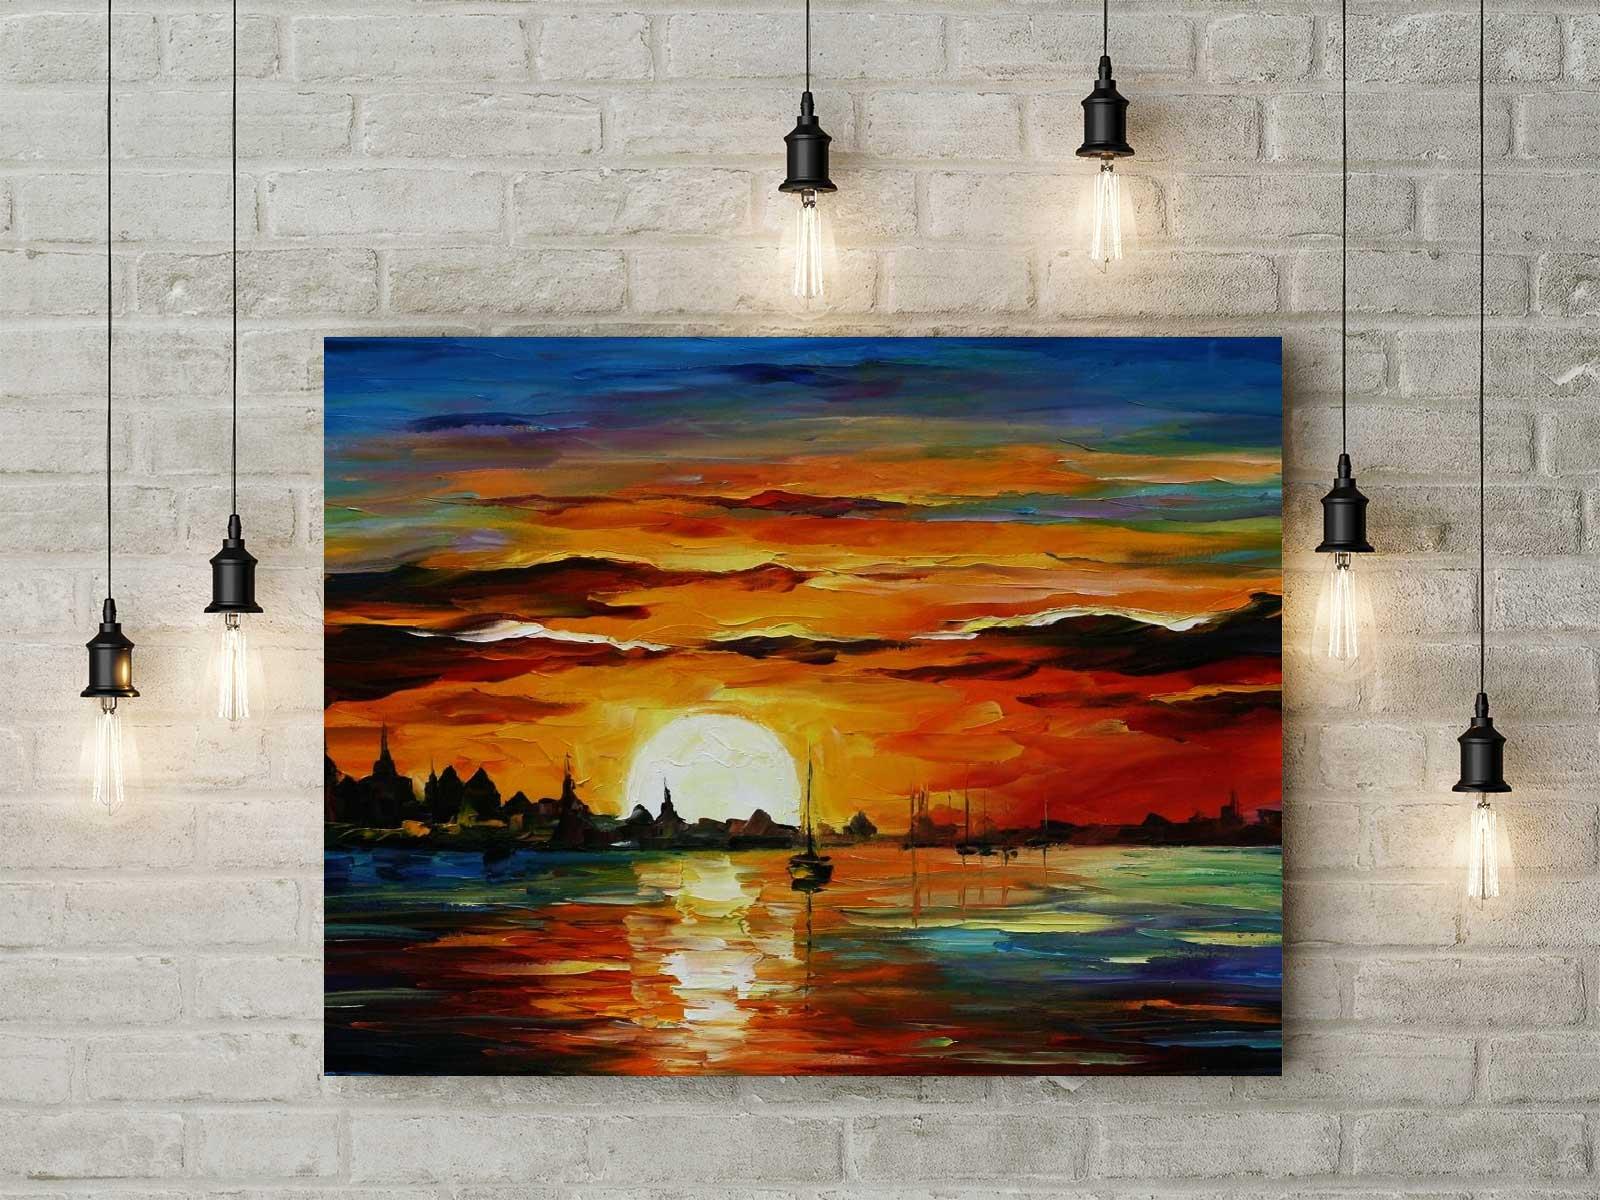 Free-Canvas-Wall-Painting-Mockup-PSD-2